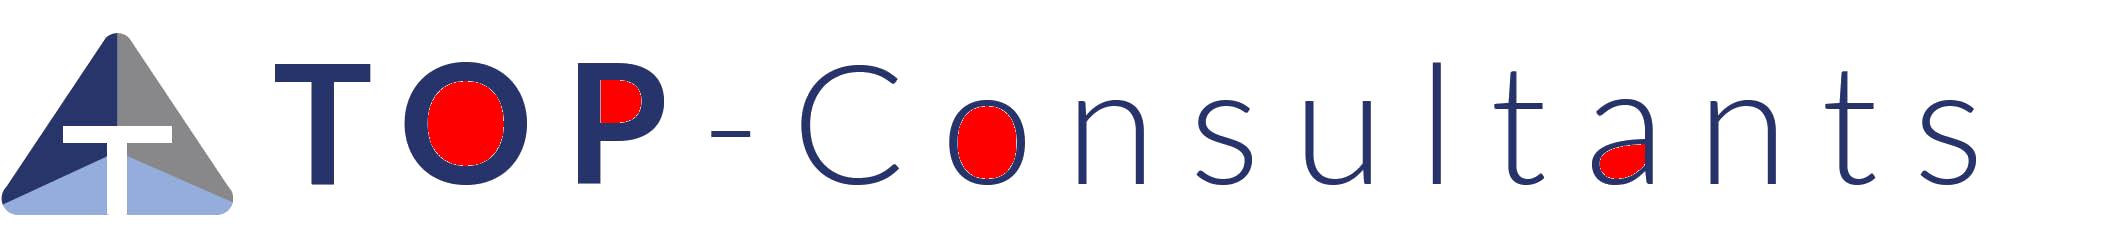 logo transparant top consultants